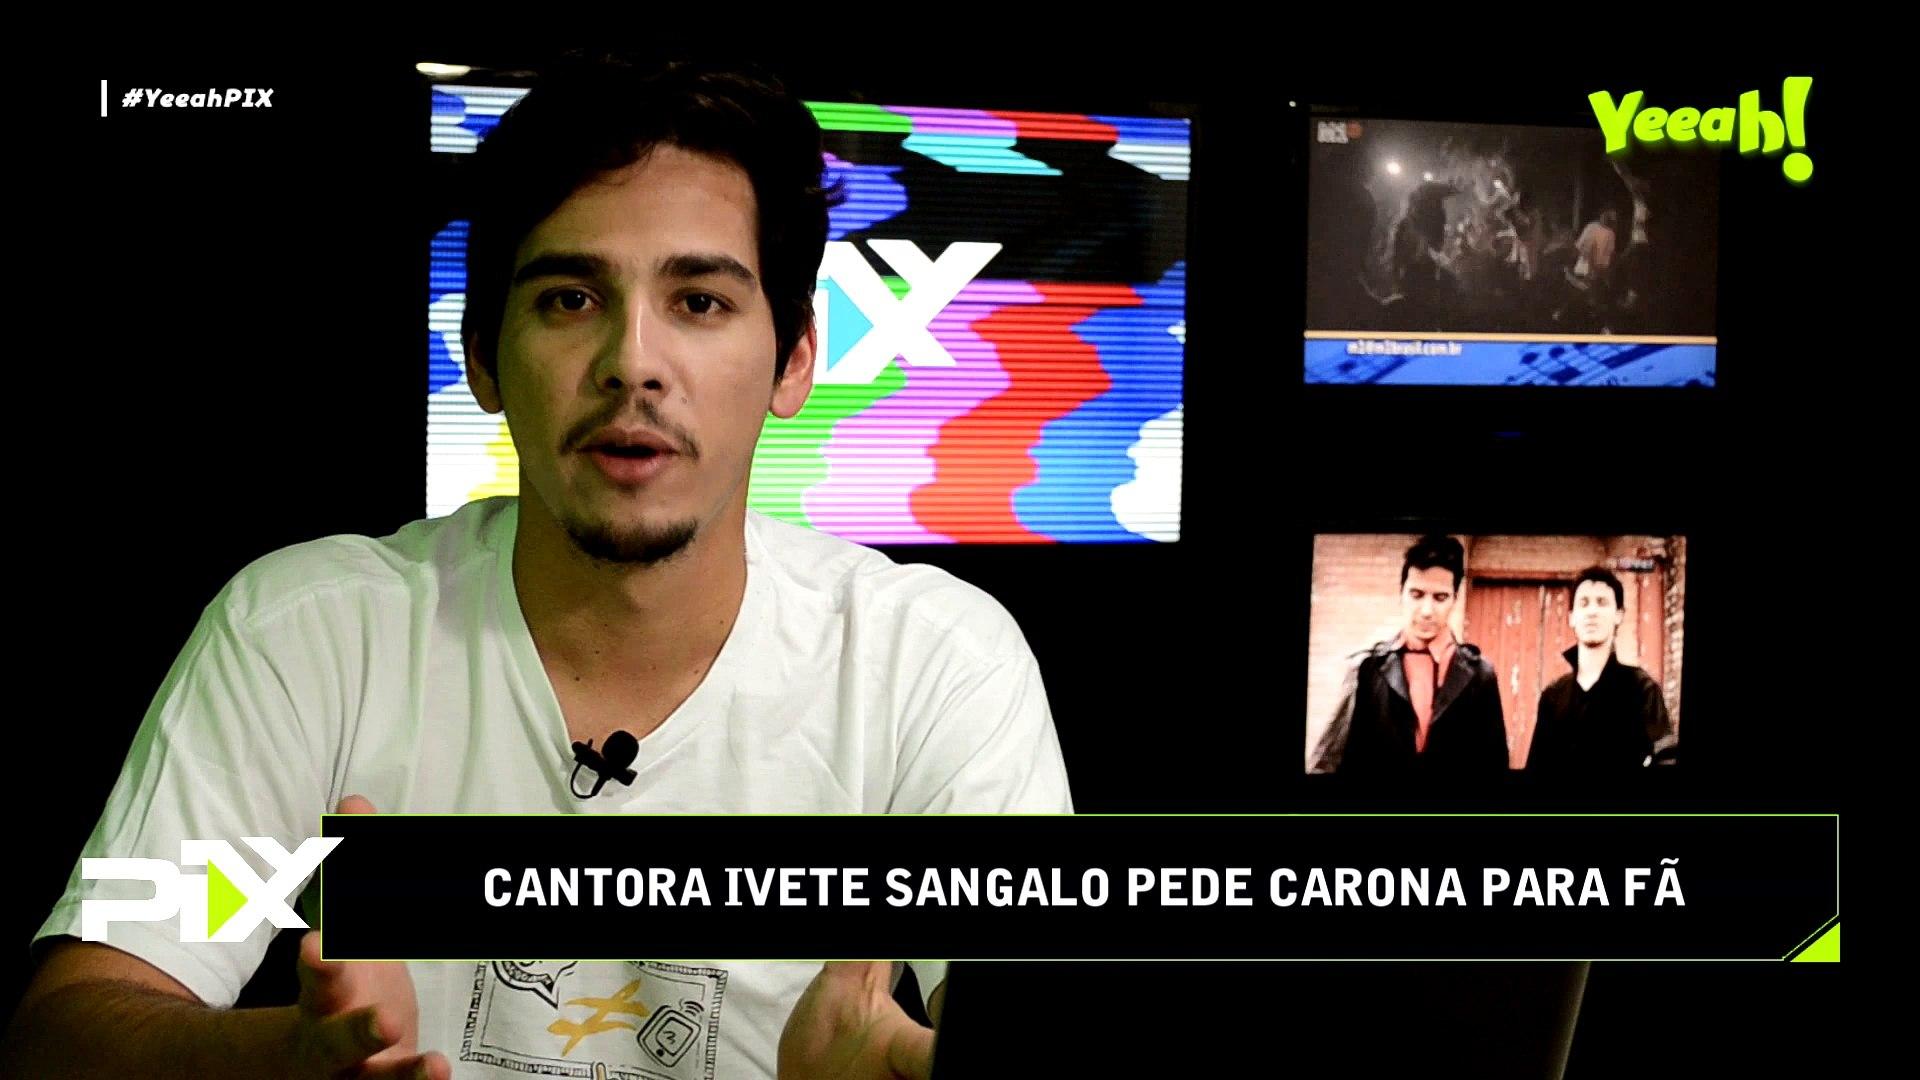 #YeeahPIX - Ivete Sangalo pede carona para fã